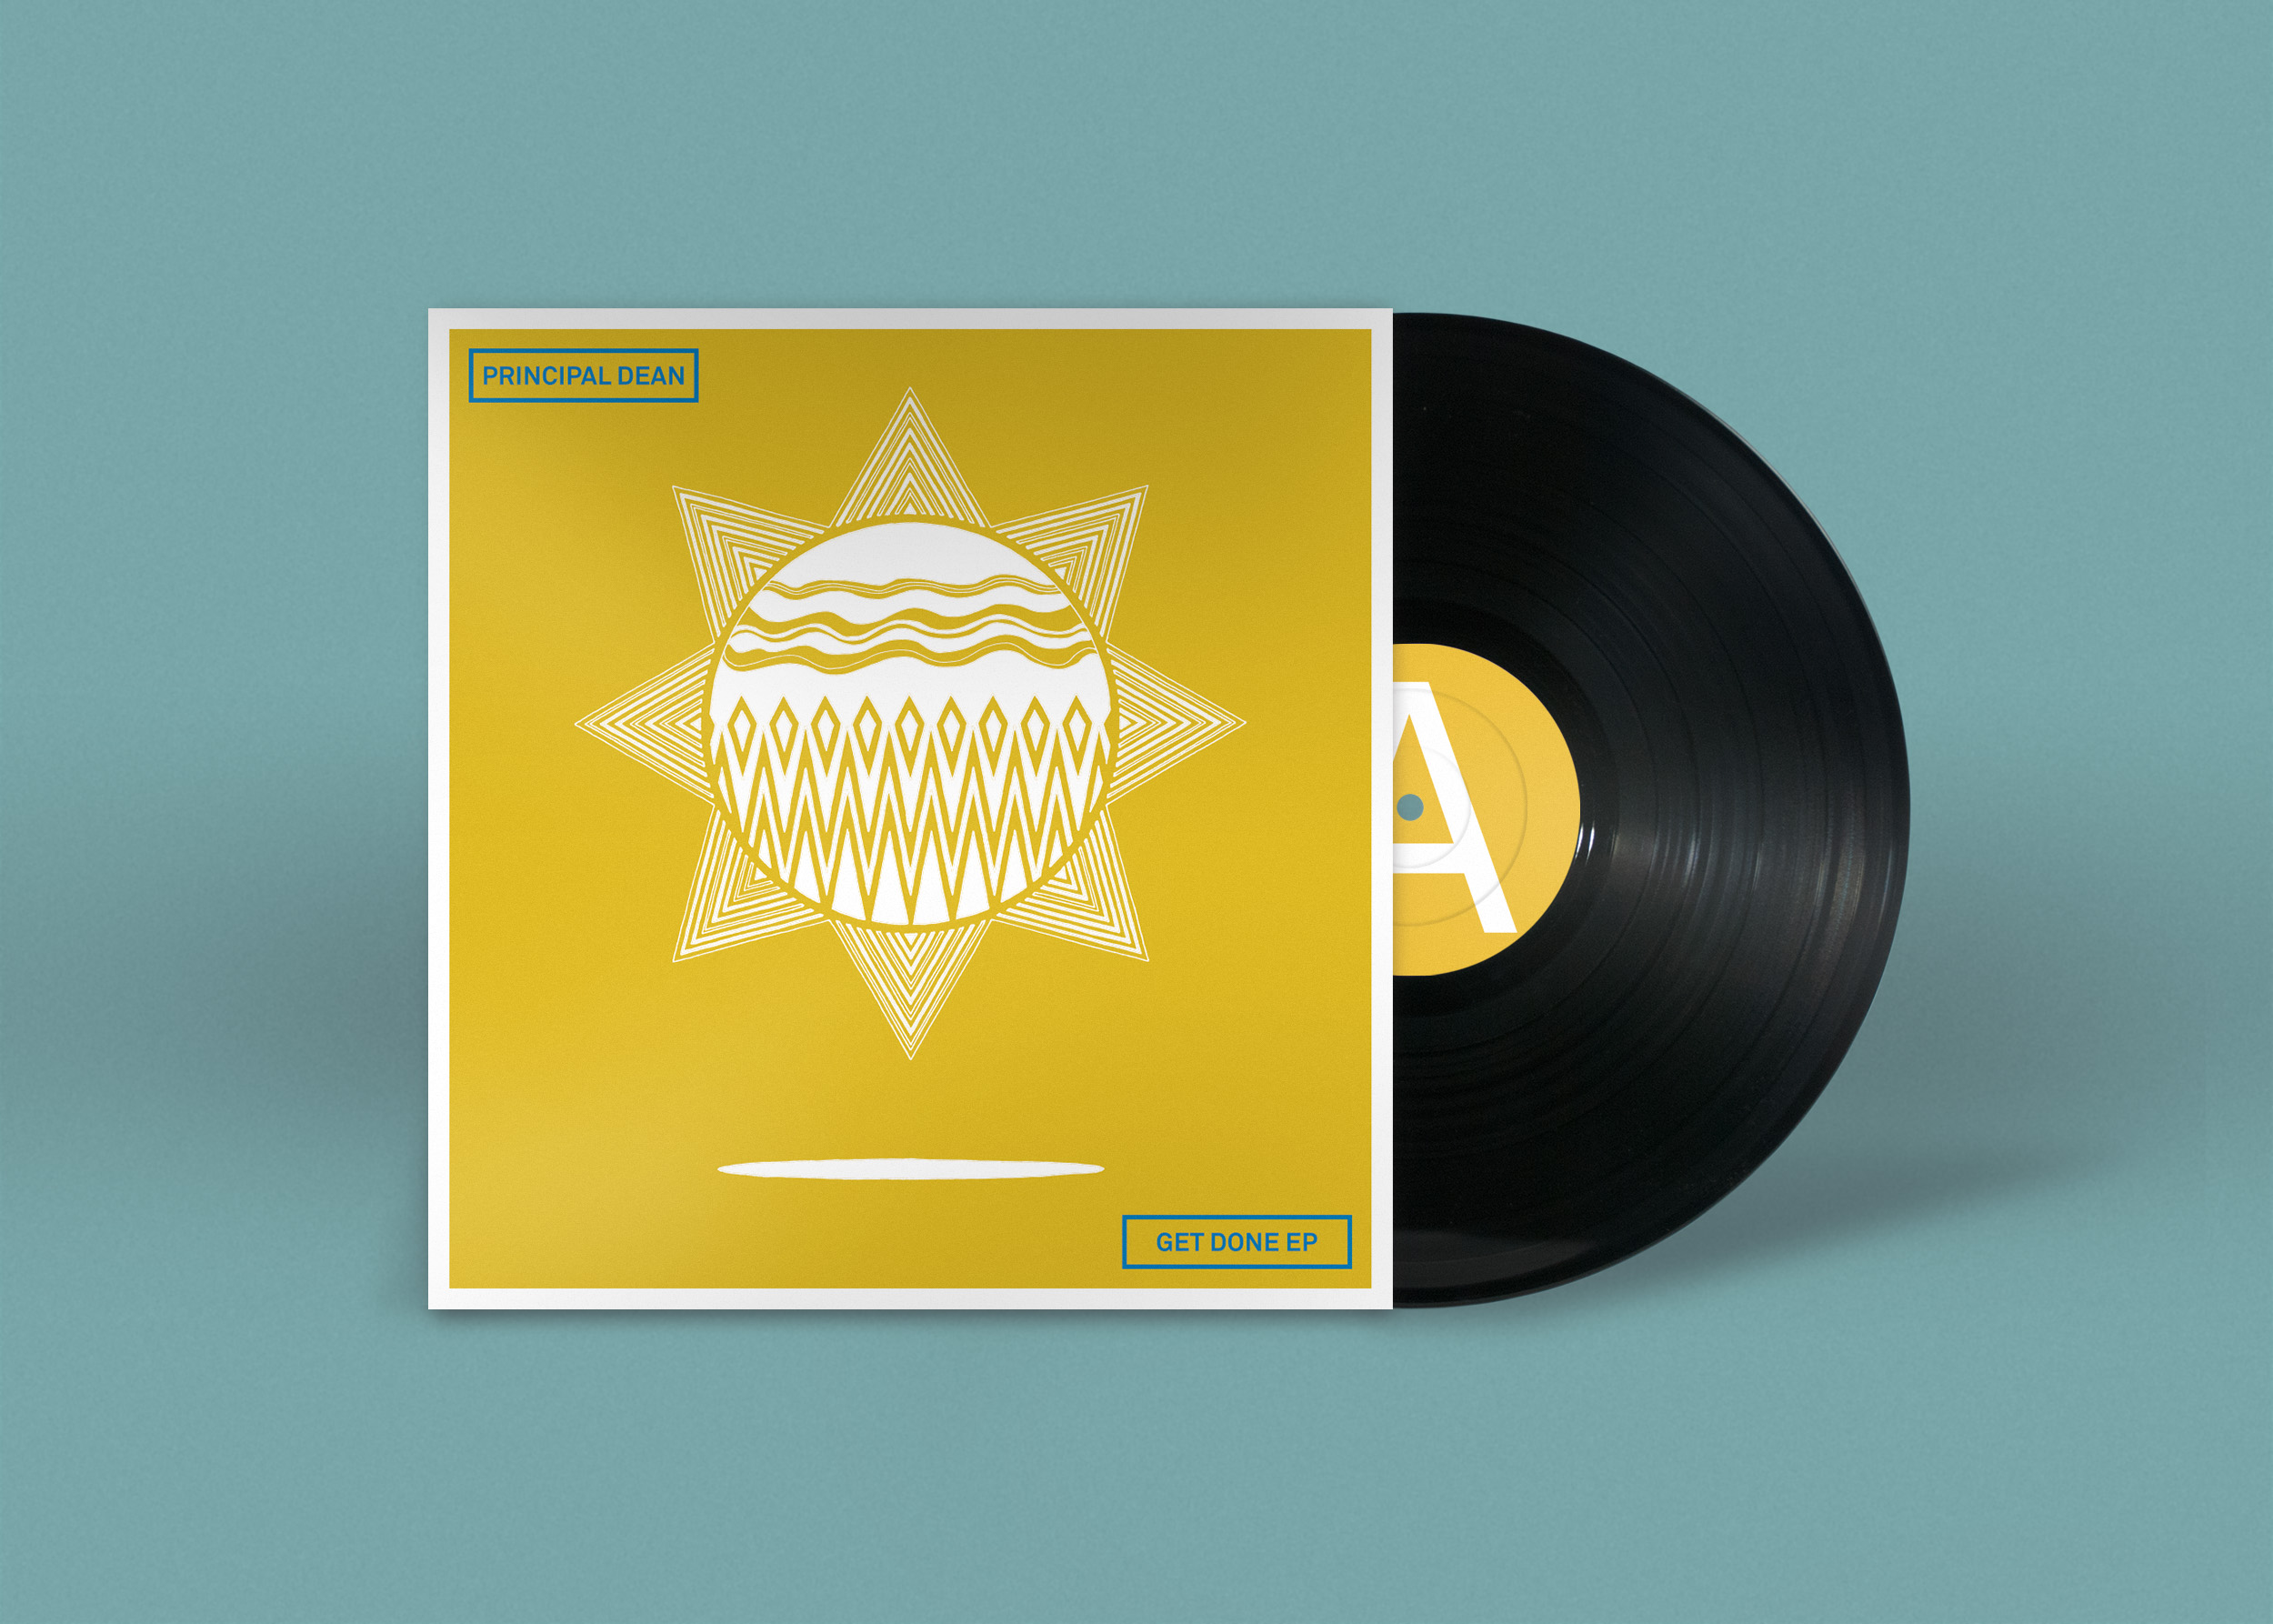 PrincipalDean12Album-Cover_Cover.jpg